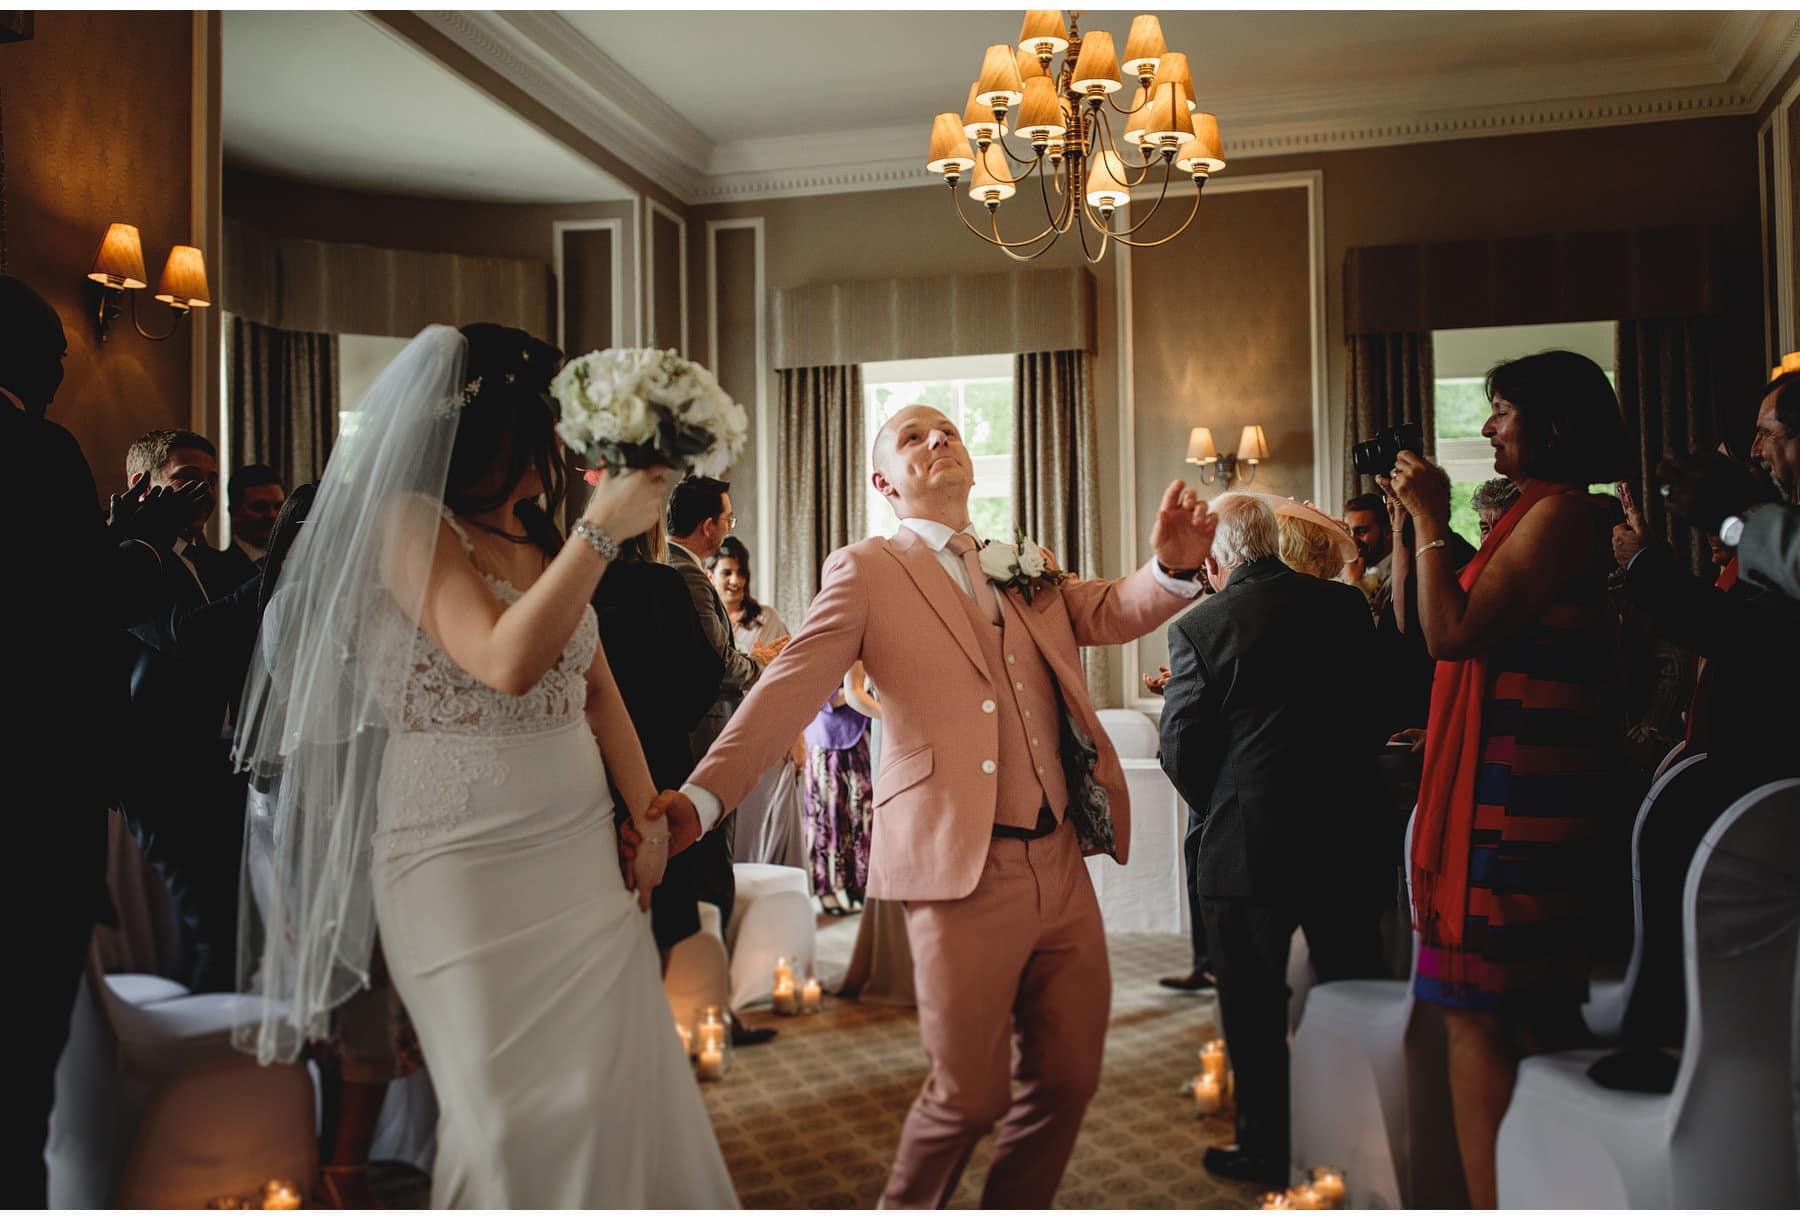 the bride & groom celebrating walking down the aisle